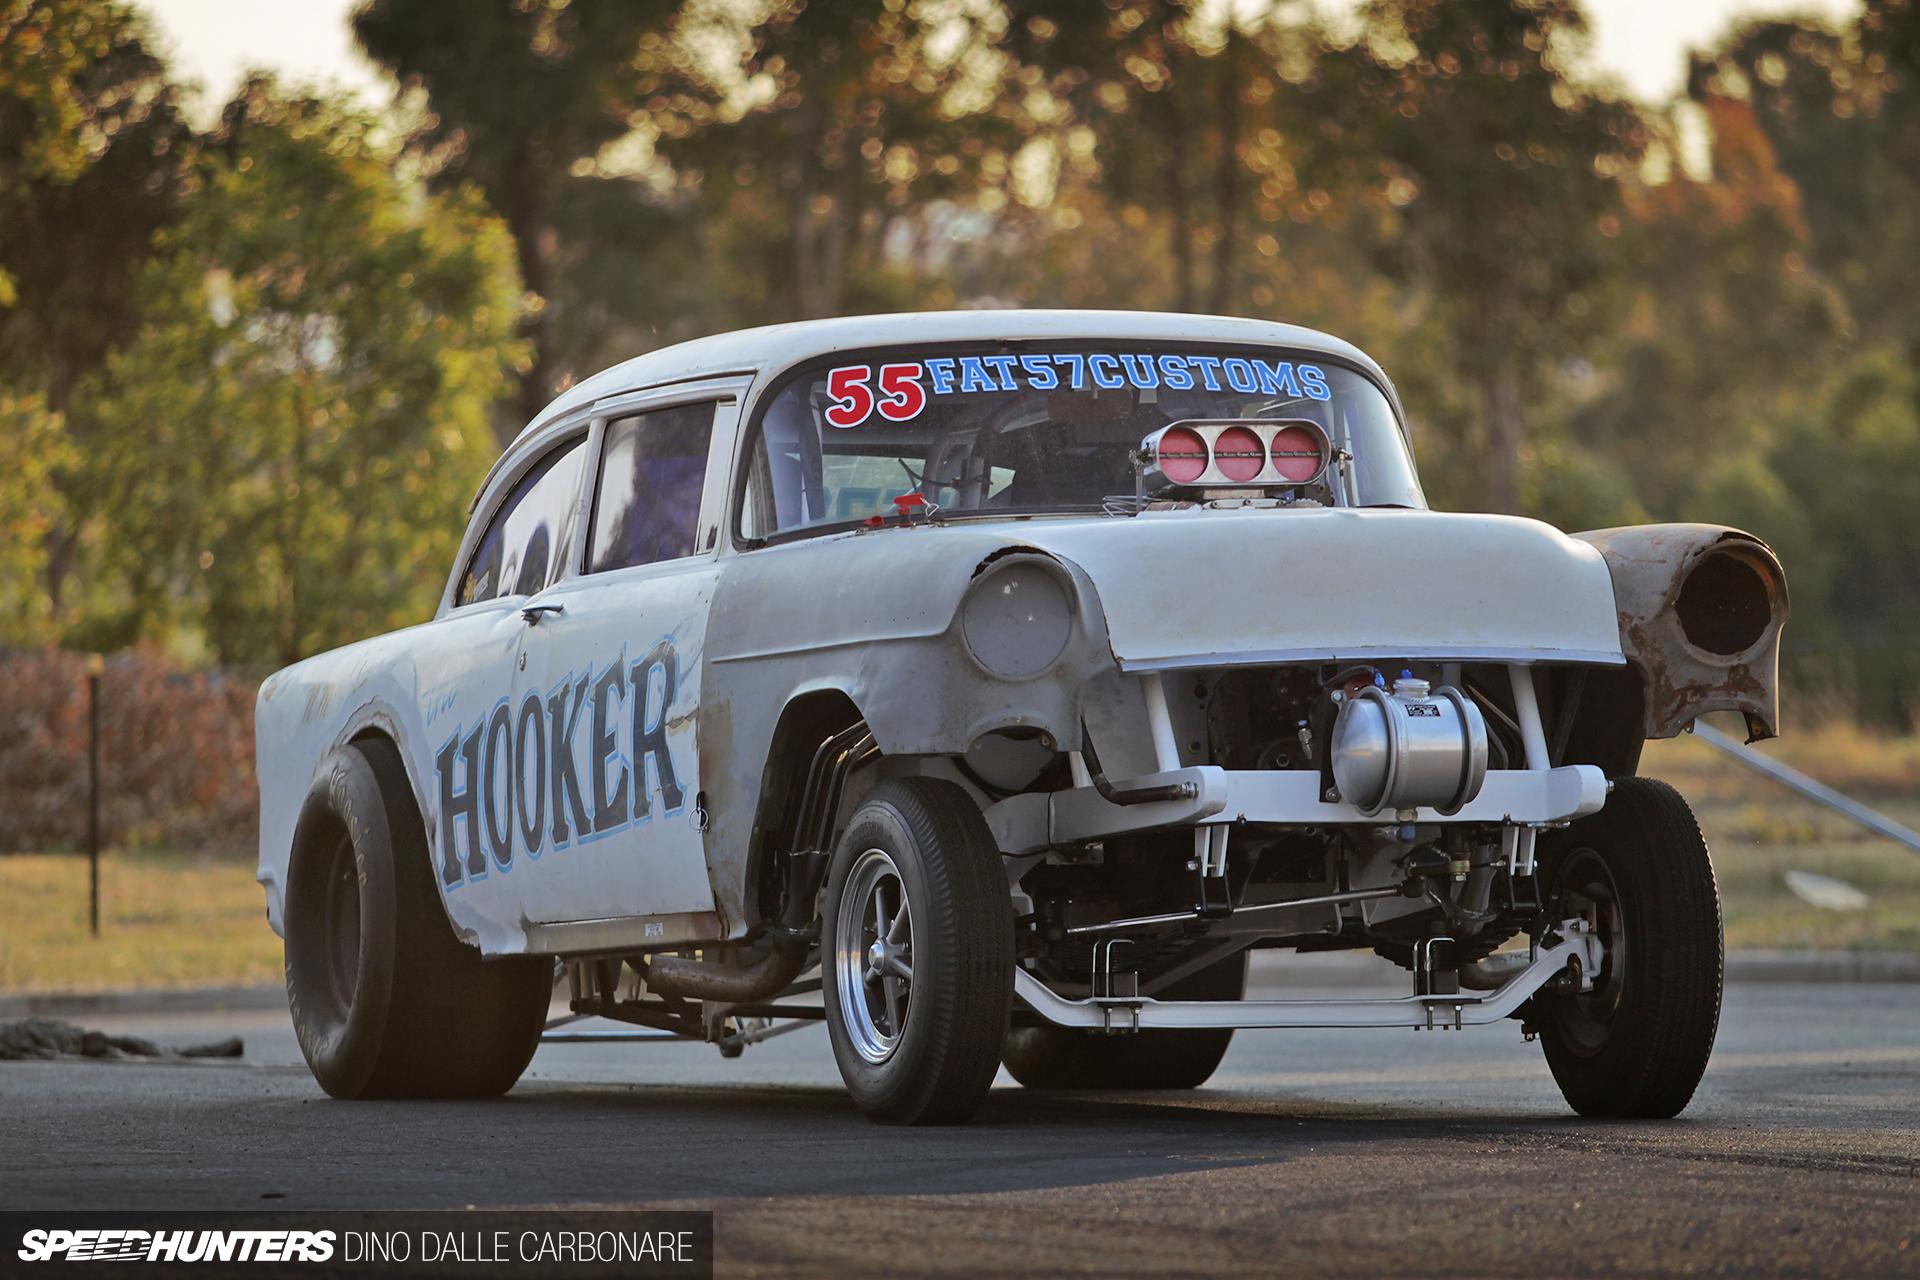 Chevrolet Gasser drag racing race hot rod rods retro t wallpaper 1920x1280